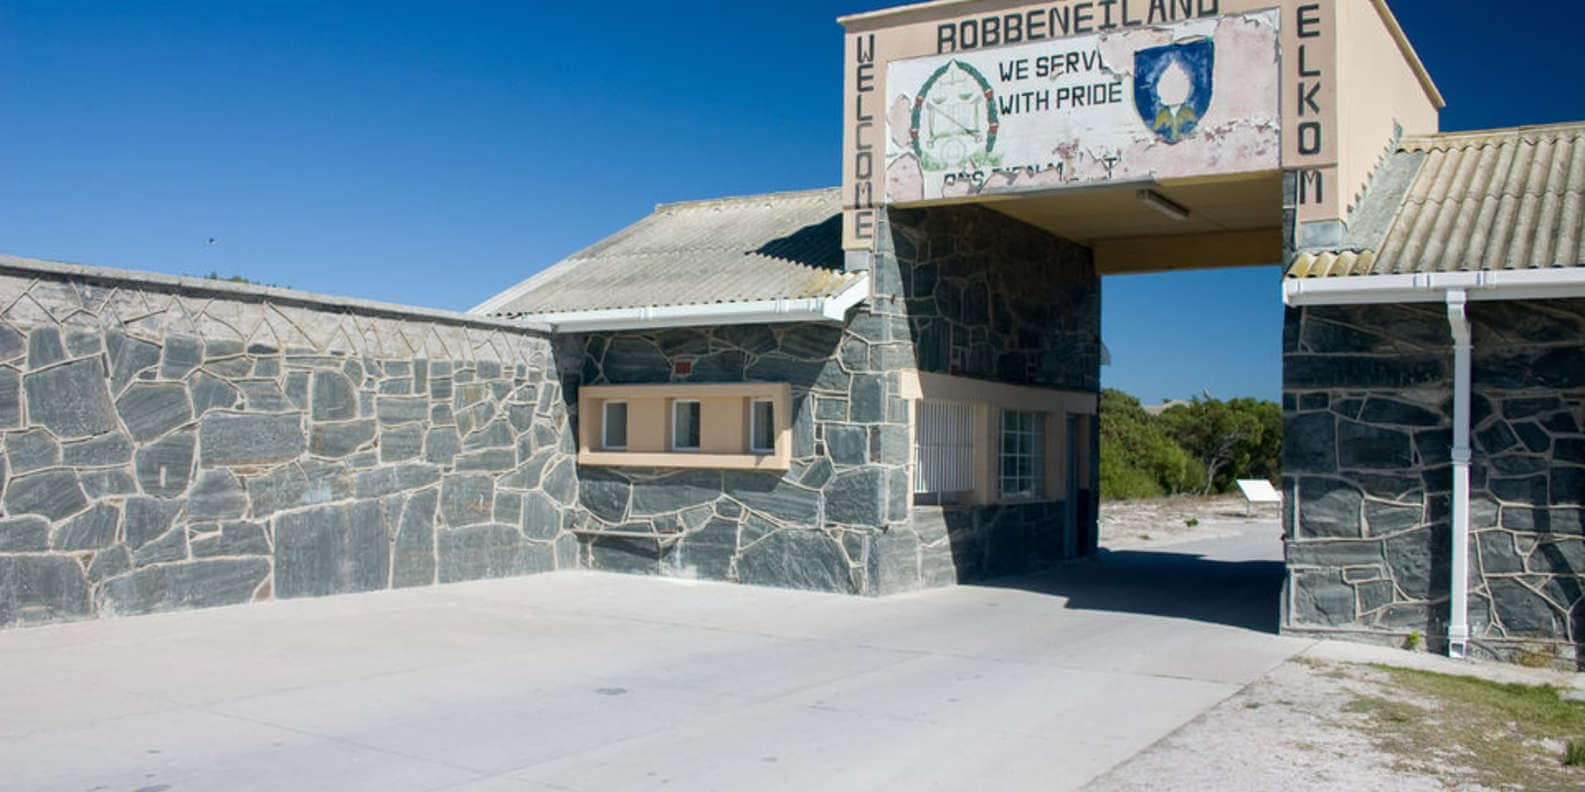 Landmarks in South Africa - Robben Island